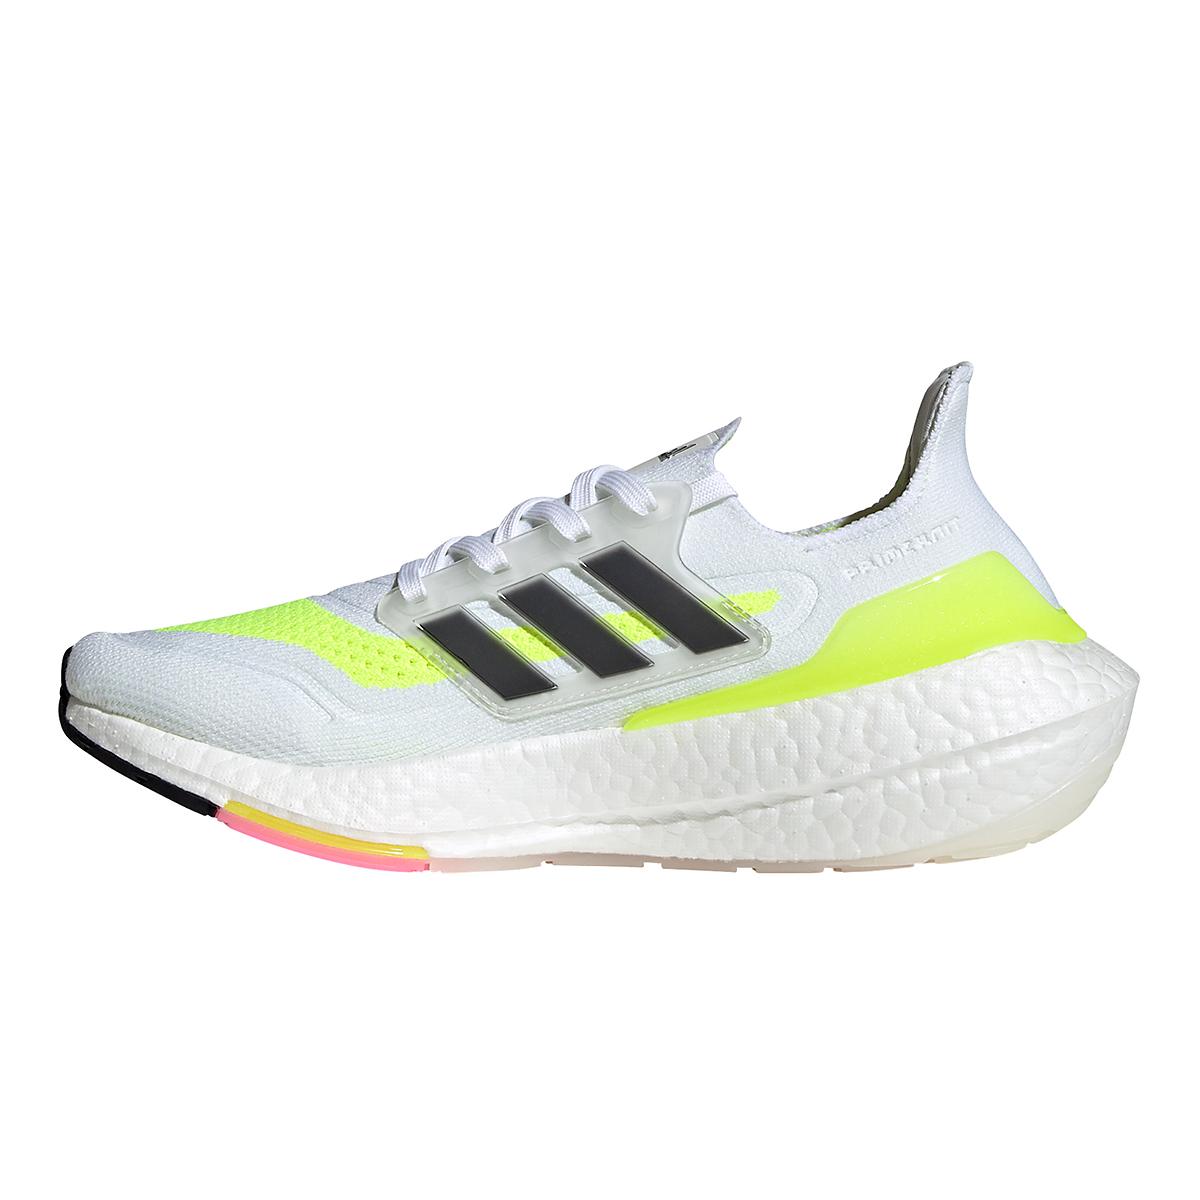 Women's Adidas Ultraboost 21 Running Shoe - Color: Cloud White/Black/Solar Yellow - Size: 5 - Width: Regular, Cloud White/Black/Solar Yellow, large, image 5